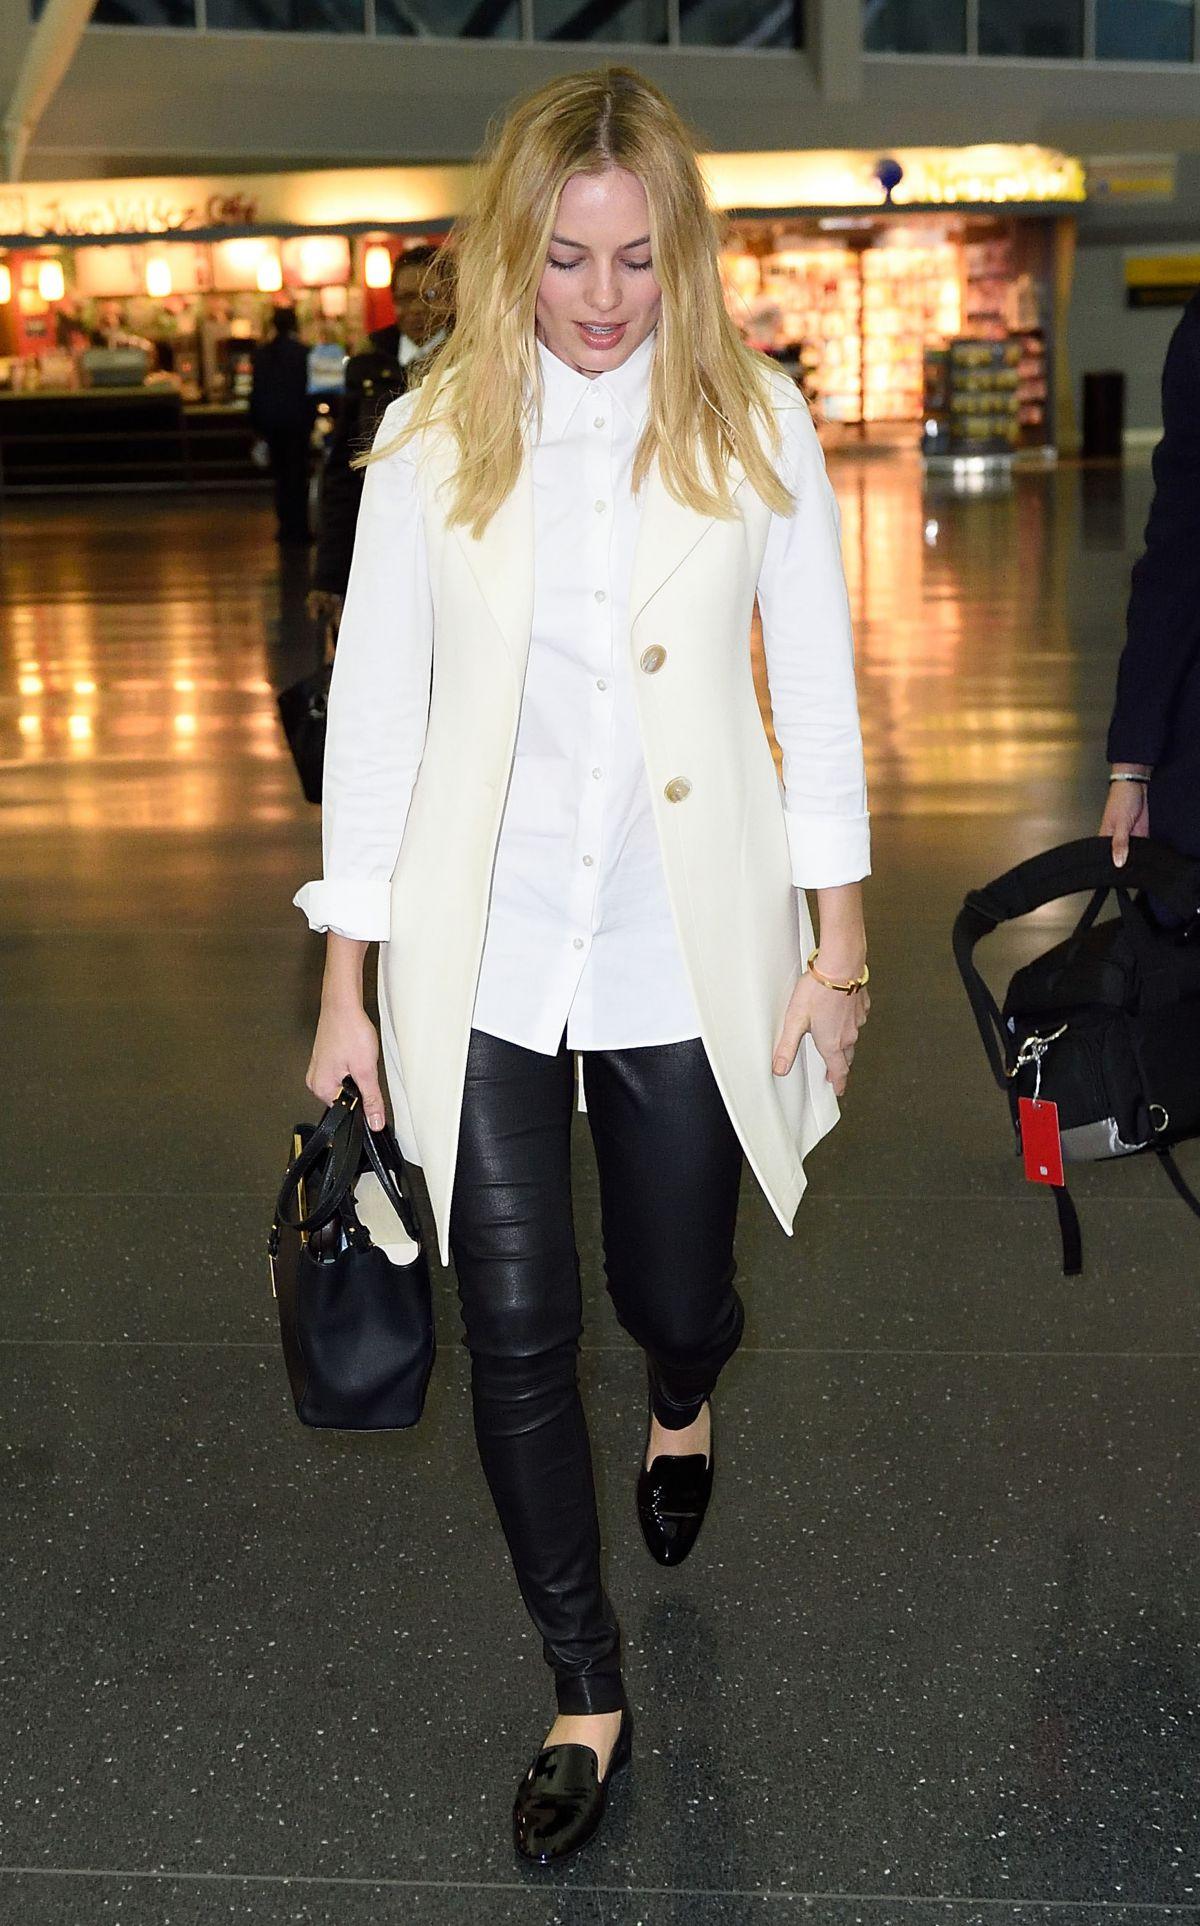 MARGOT ROBBIE at JFK Airport in New York 02/29/2016